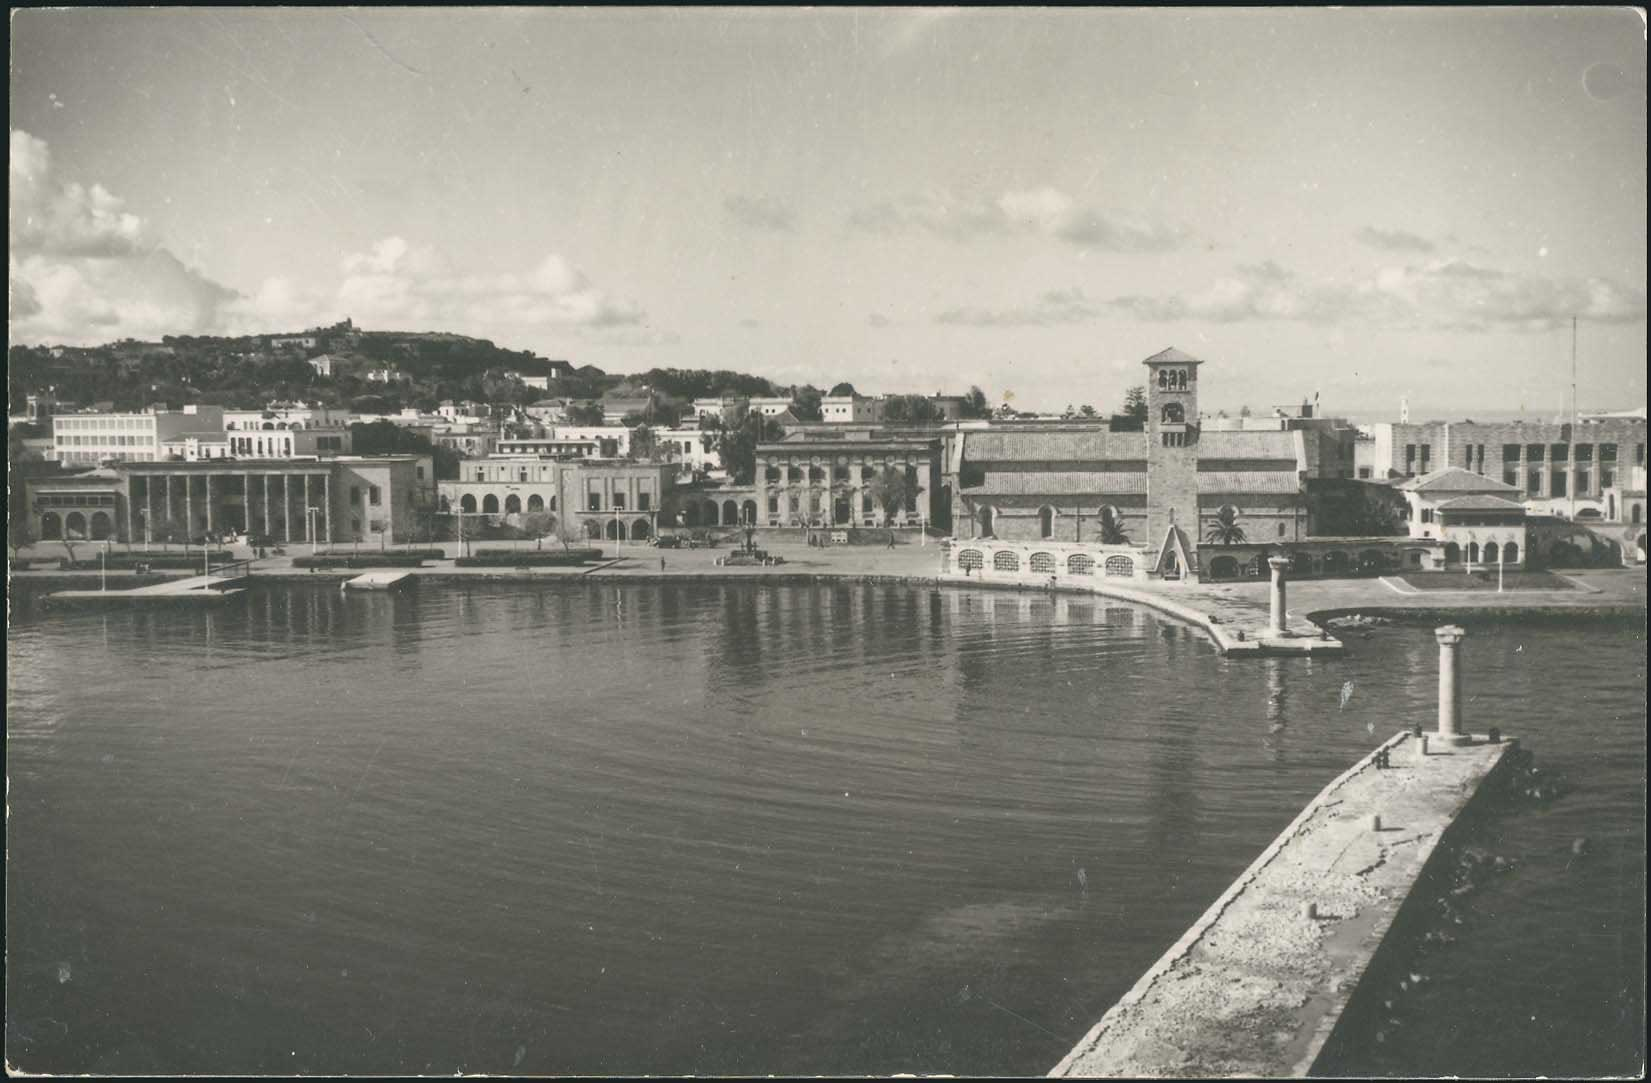 Lot 1264 - -  PICTURE POSTCARDS dodecanese islands -  A. Karamitsos Public & Live Internet Auction 683